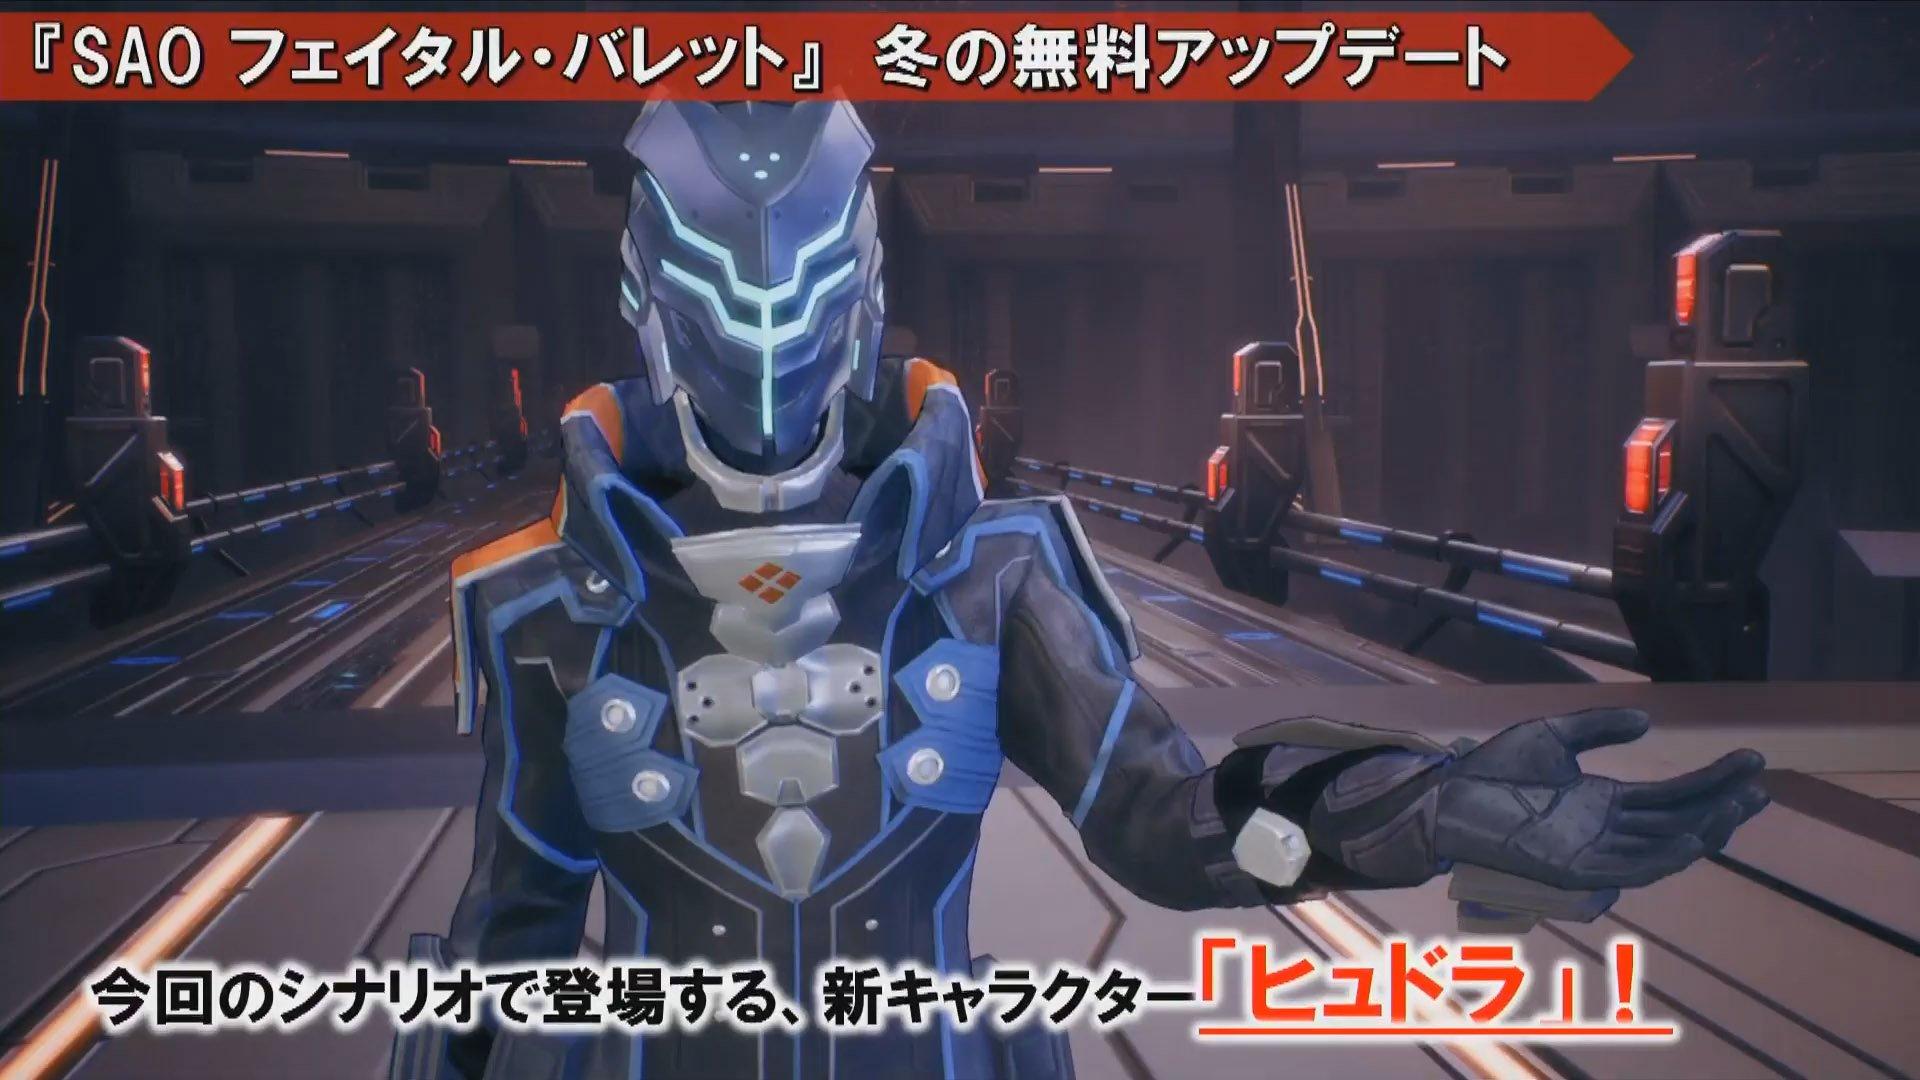 Sword Art Online Fatal Bullet Winter Update Launches February 3